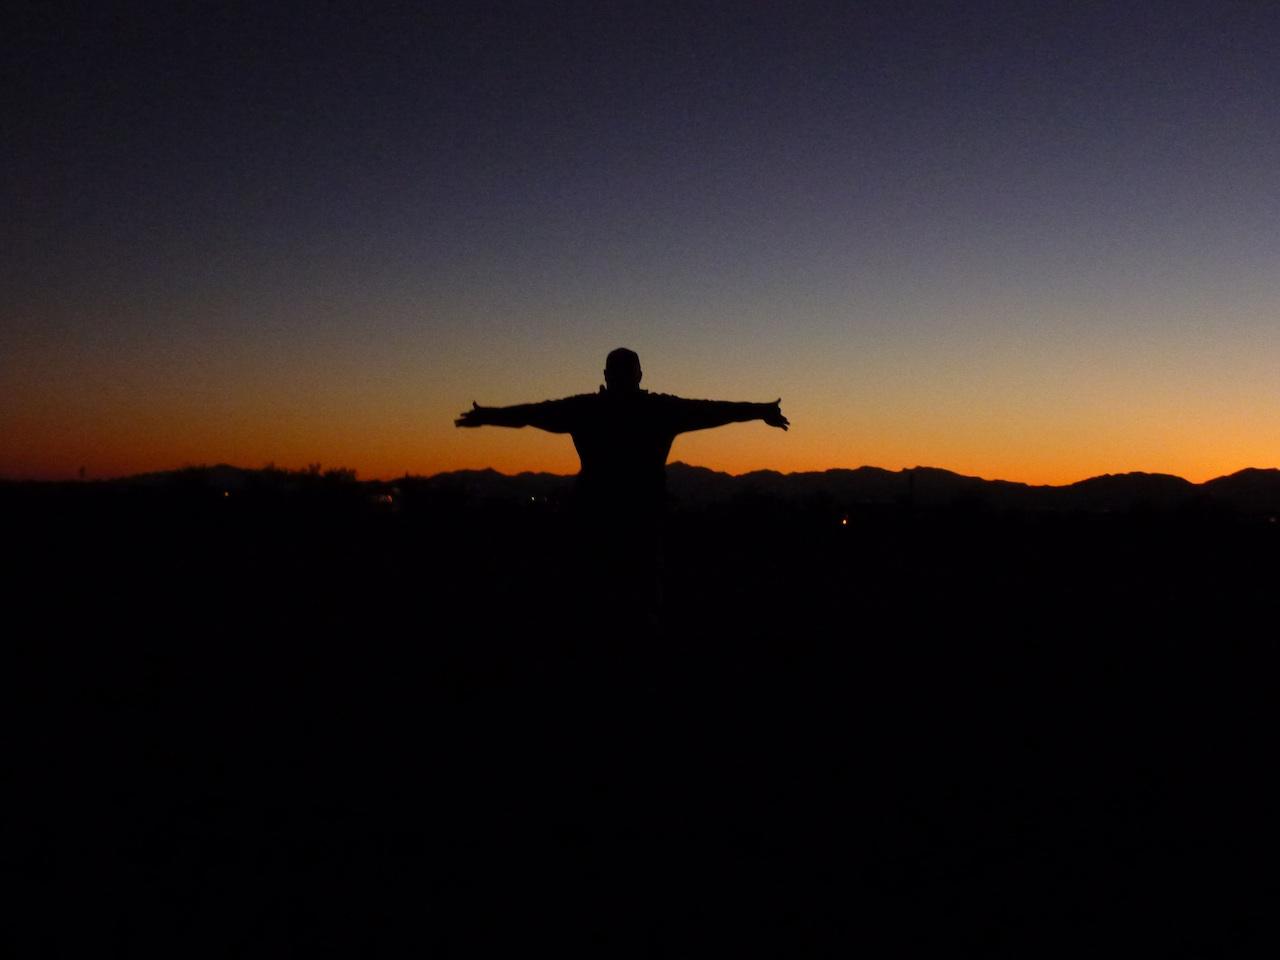 David Enjoying The Sunset